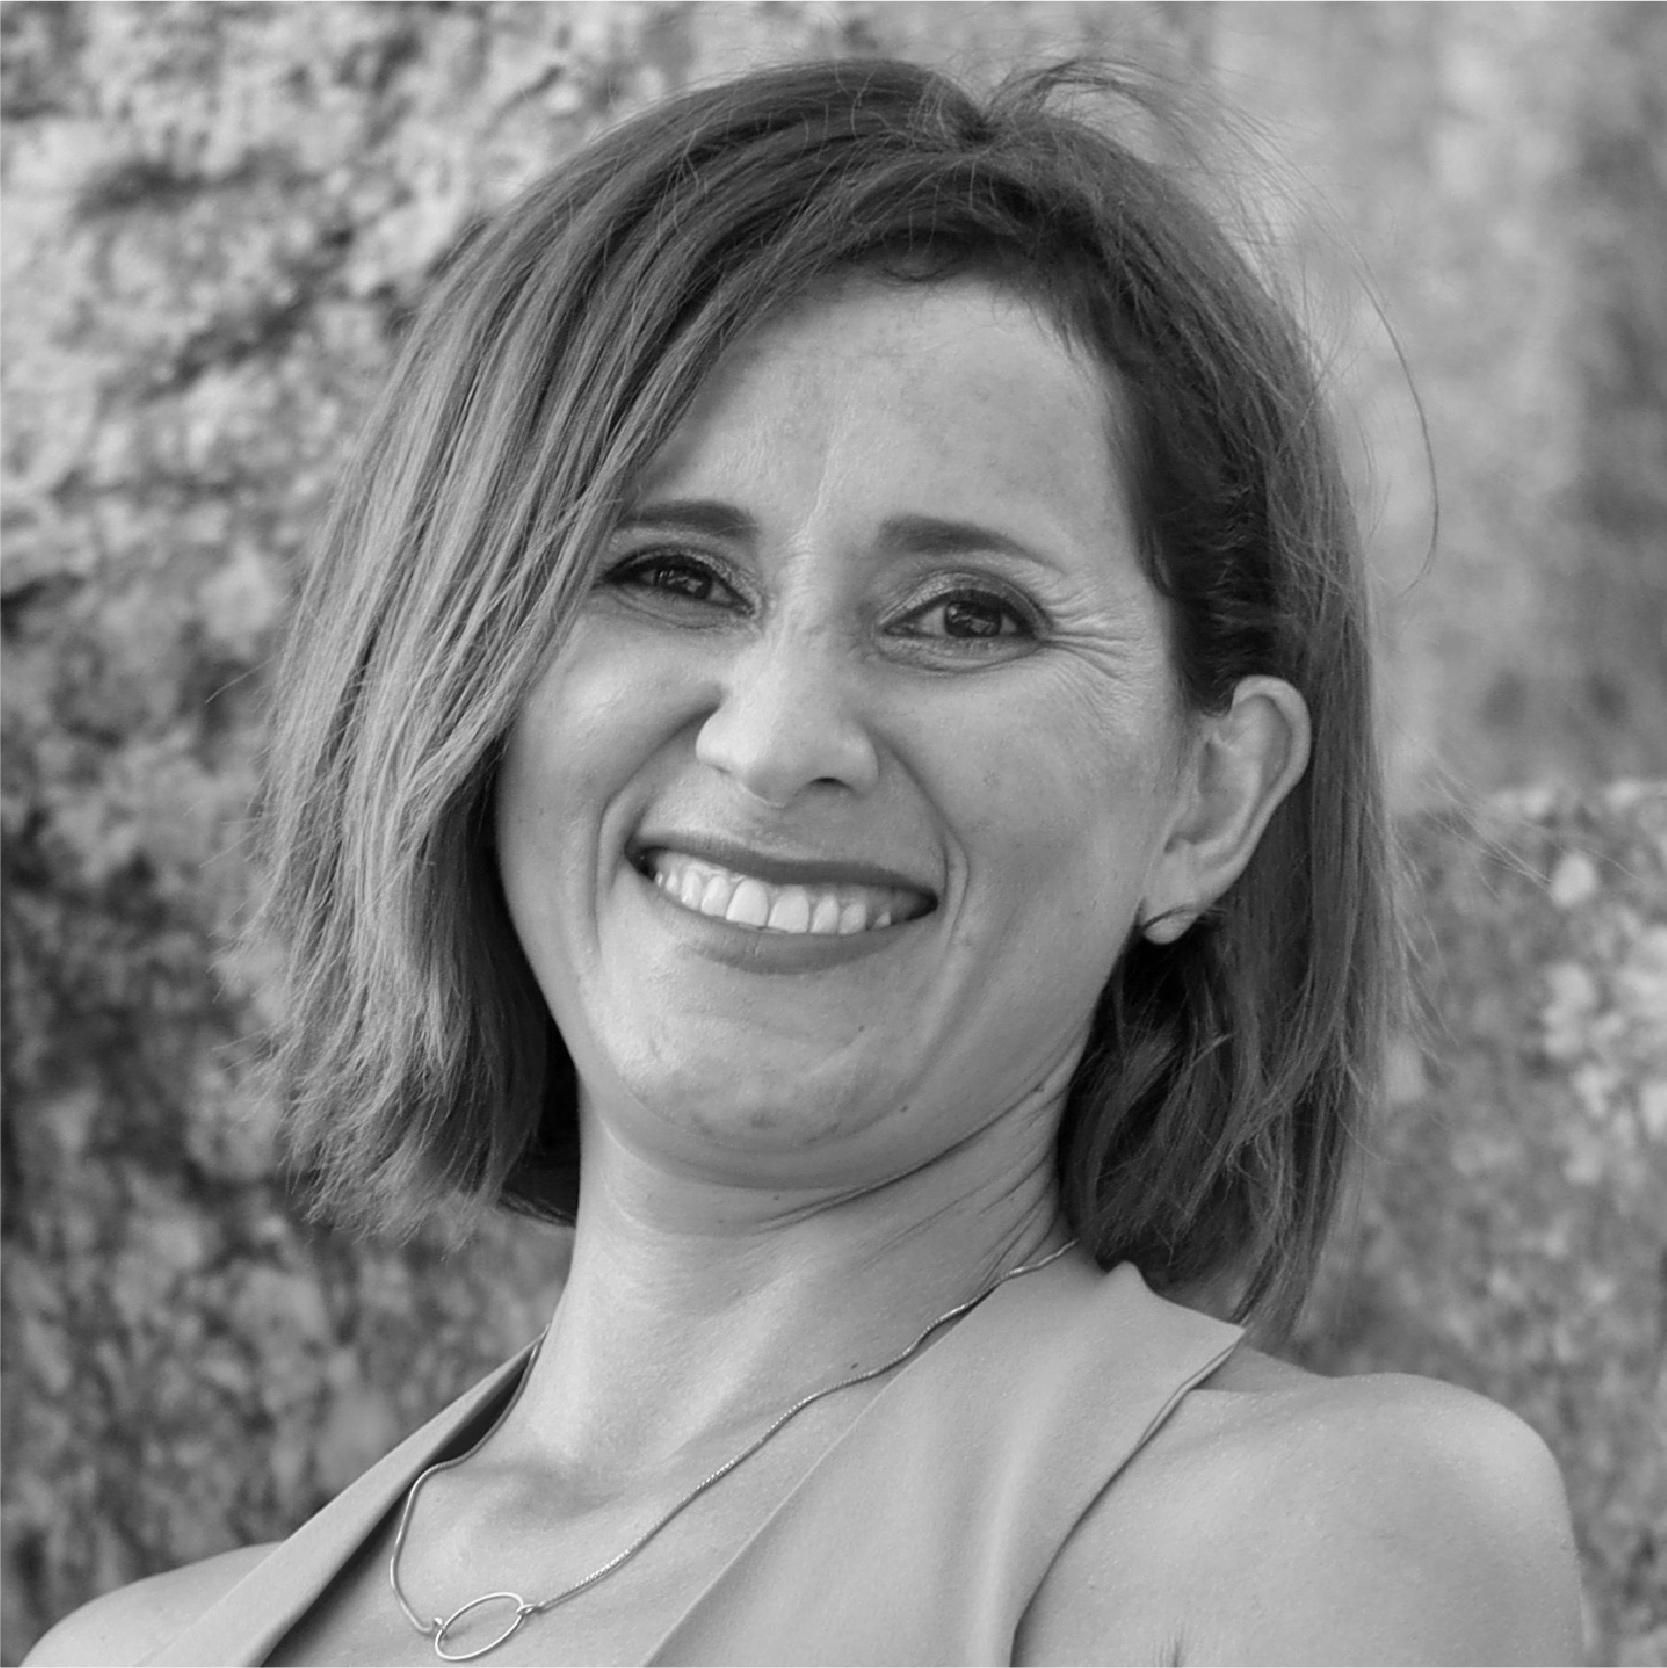 Lucia Carolina Quijano Prieto